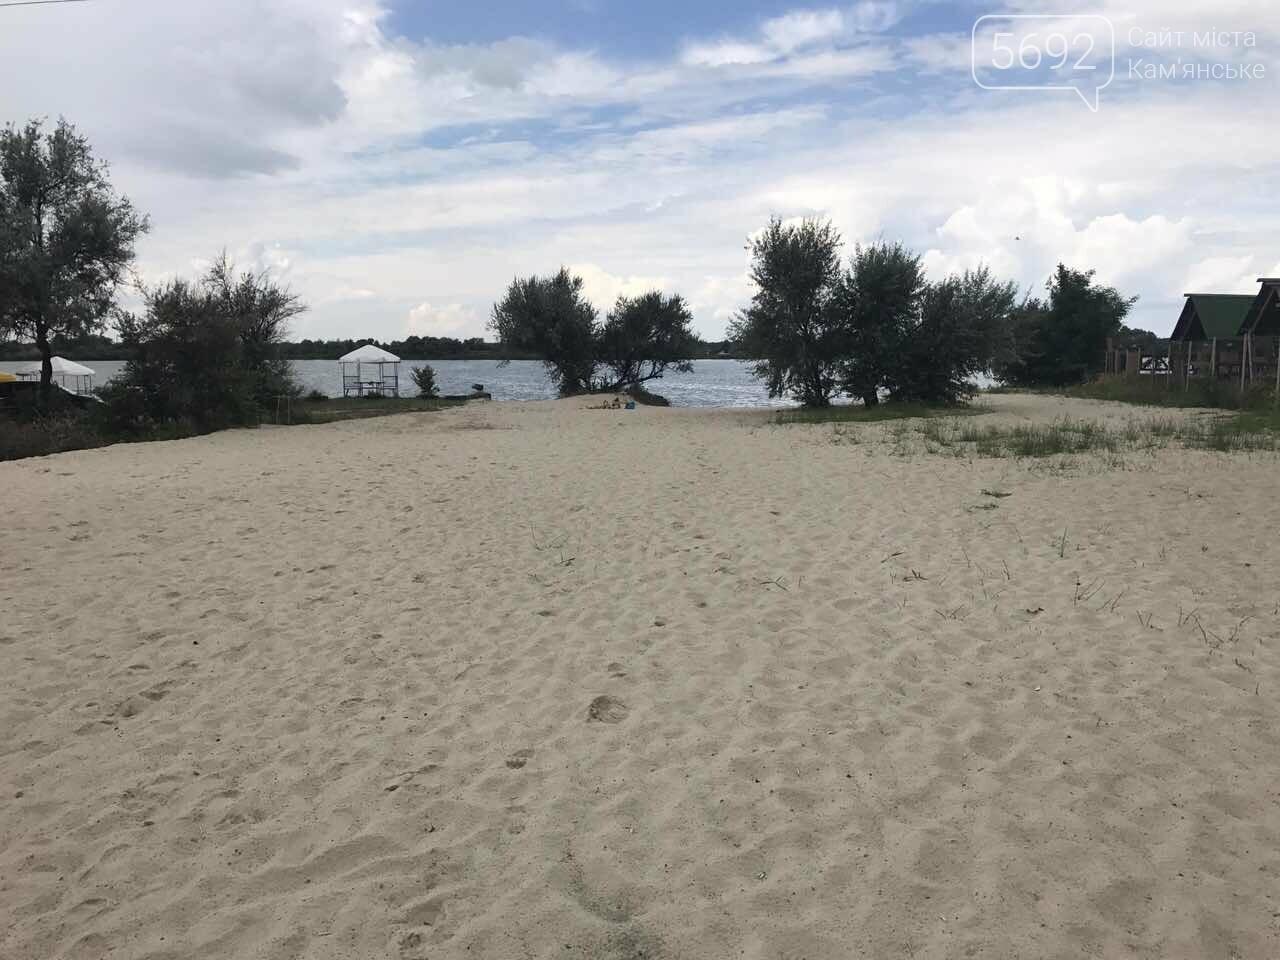 Лето в разгаре: на Голубом озере под Каменским открылся OrangeBeach, фото-2